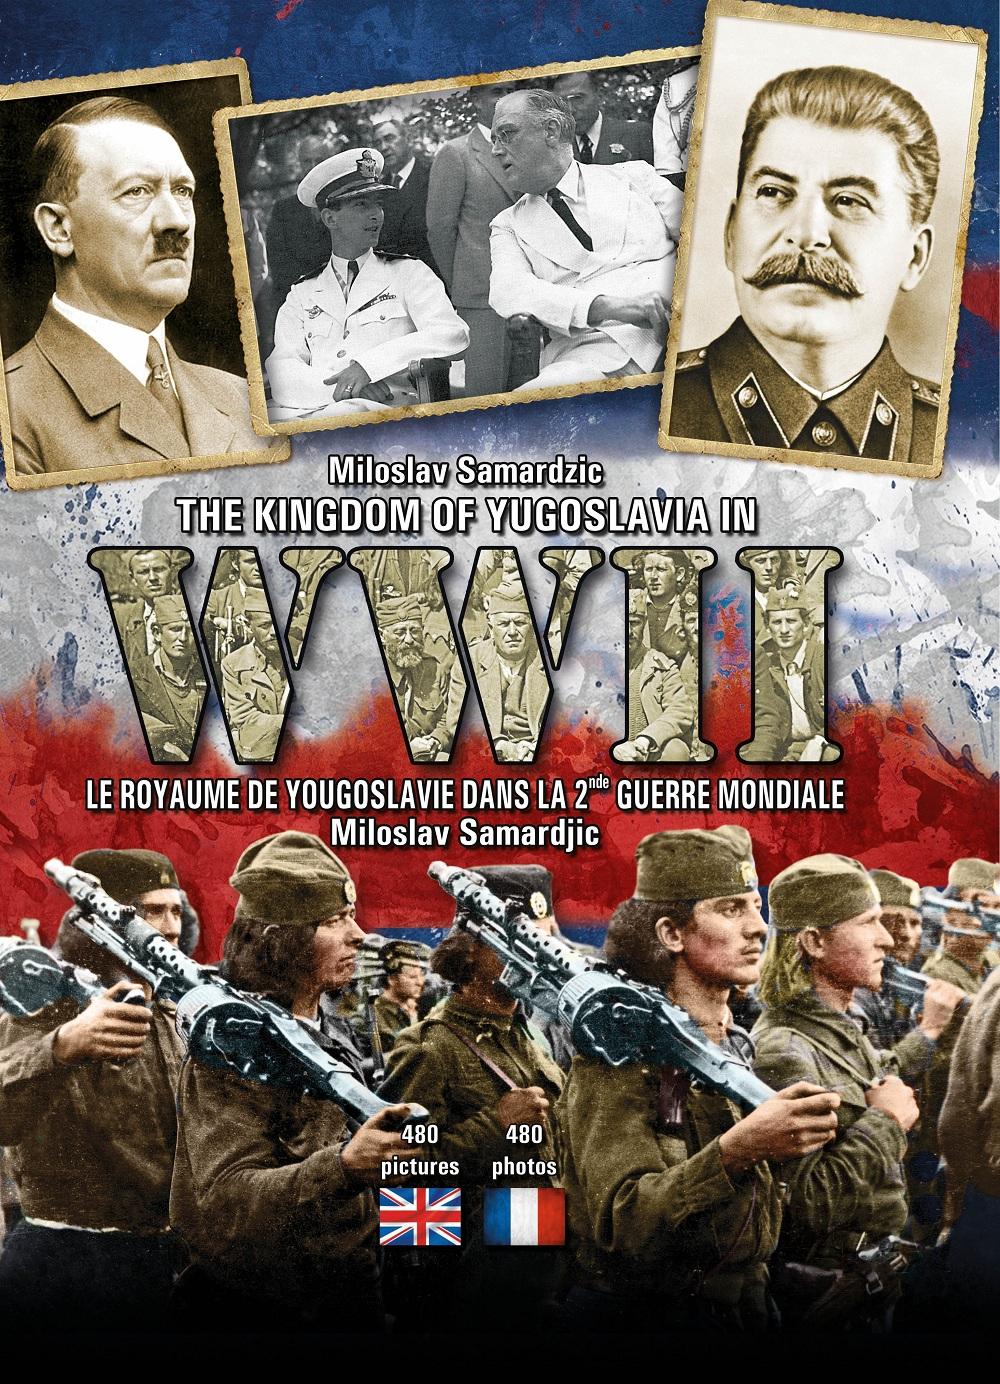 LE ROYAUME DE YOUGOSLAVIE DANS LA 2NDE GUERRE MONDIALE/KINGDOM OF YUGOSLAVIA IN WWII